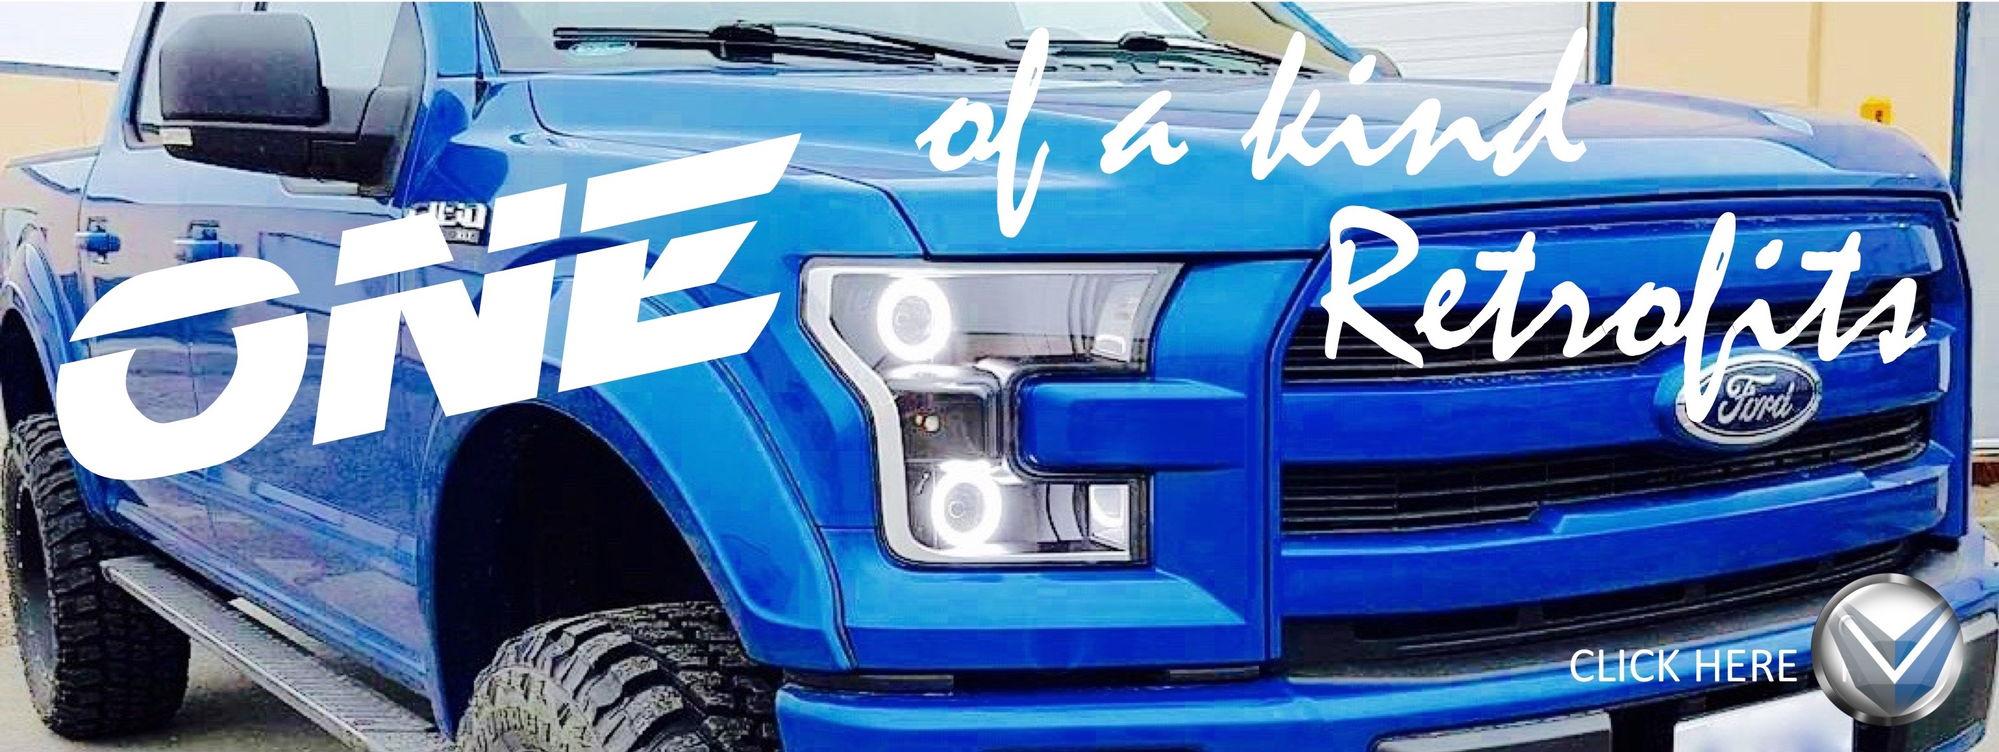 2015 ford f150 custom retrofitted headlights